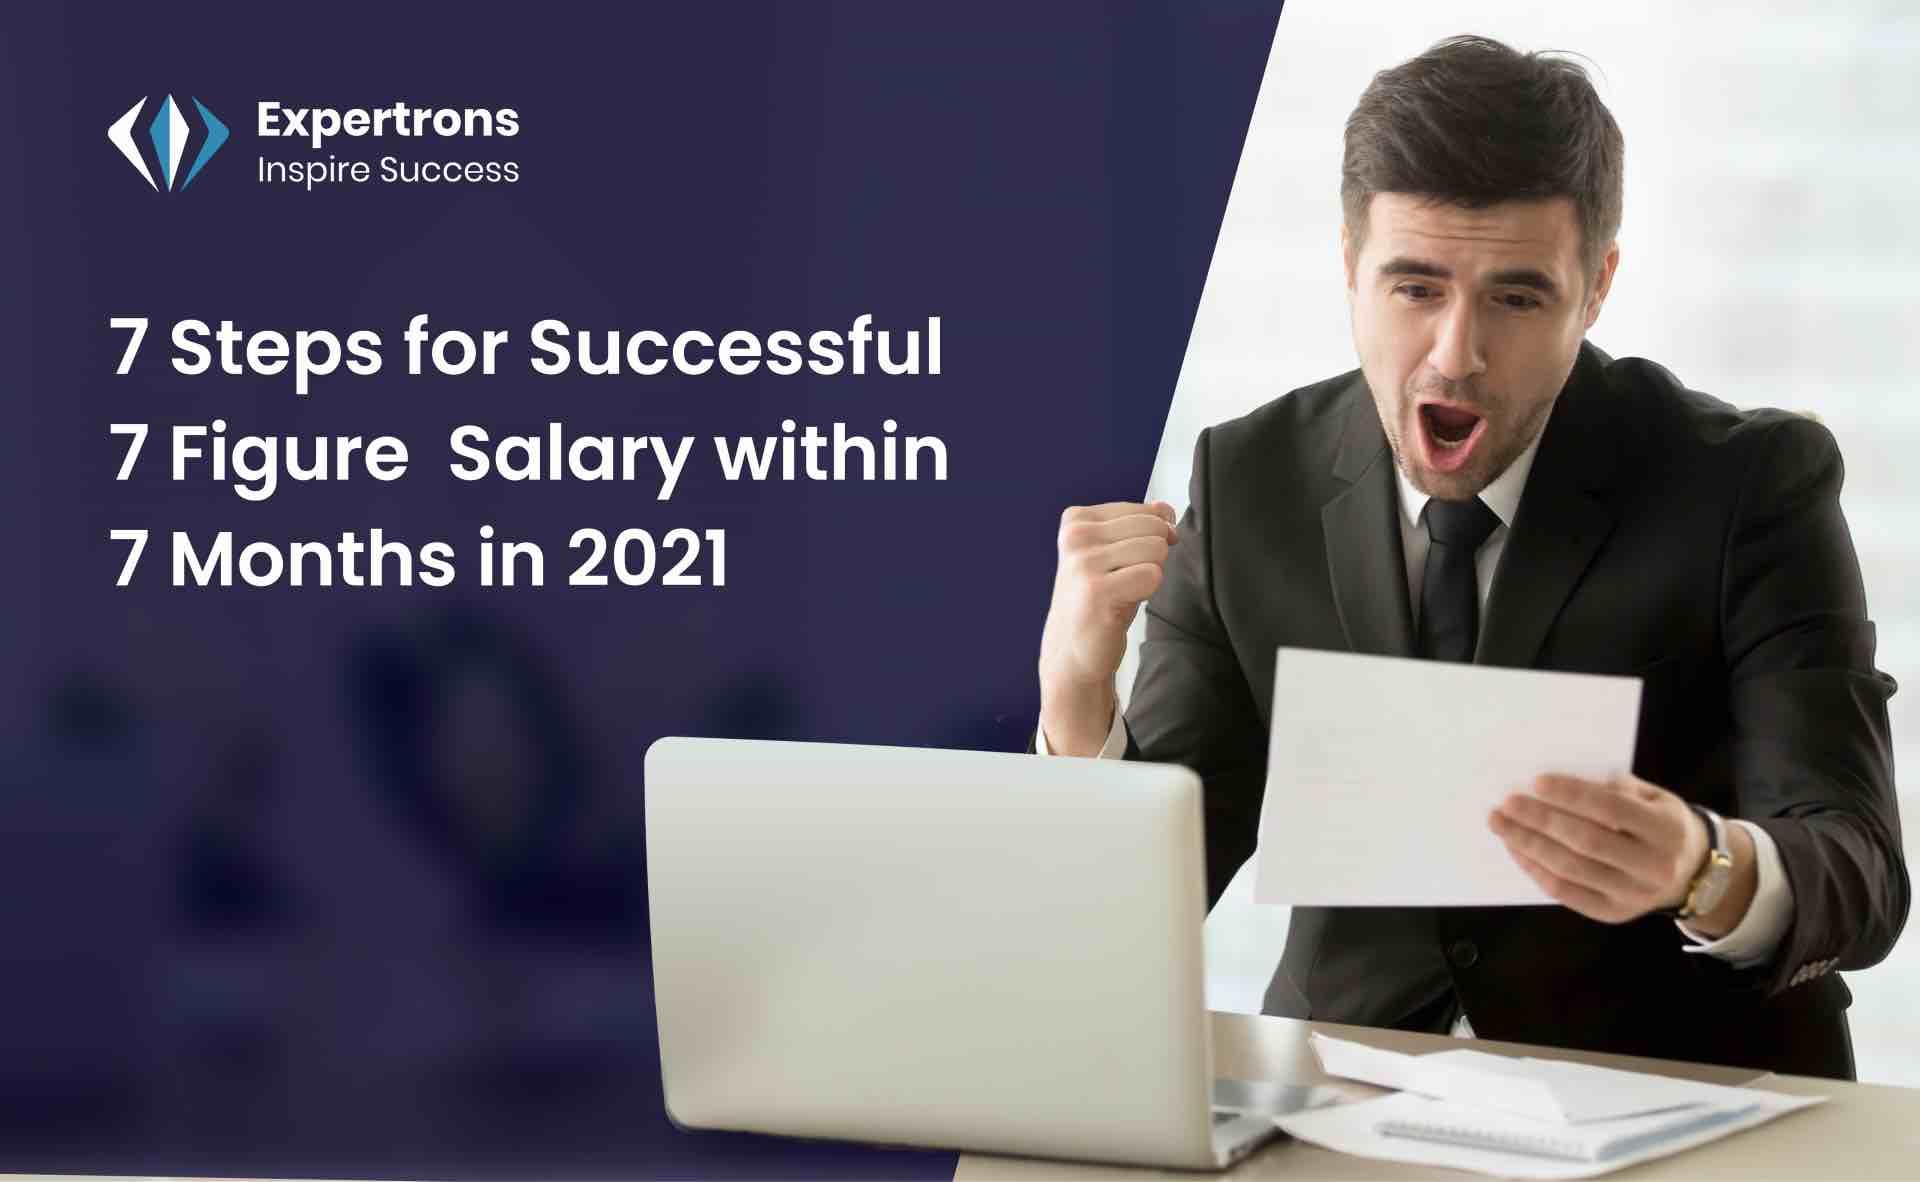 successful career, success and failure, success in life, way to success, 7 figure salary